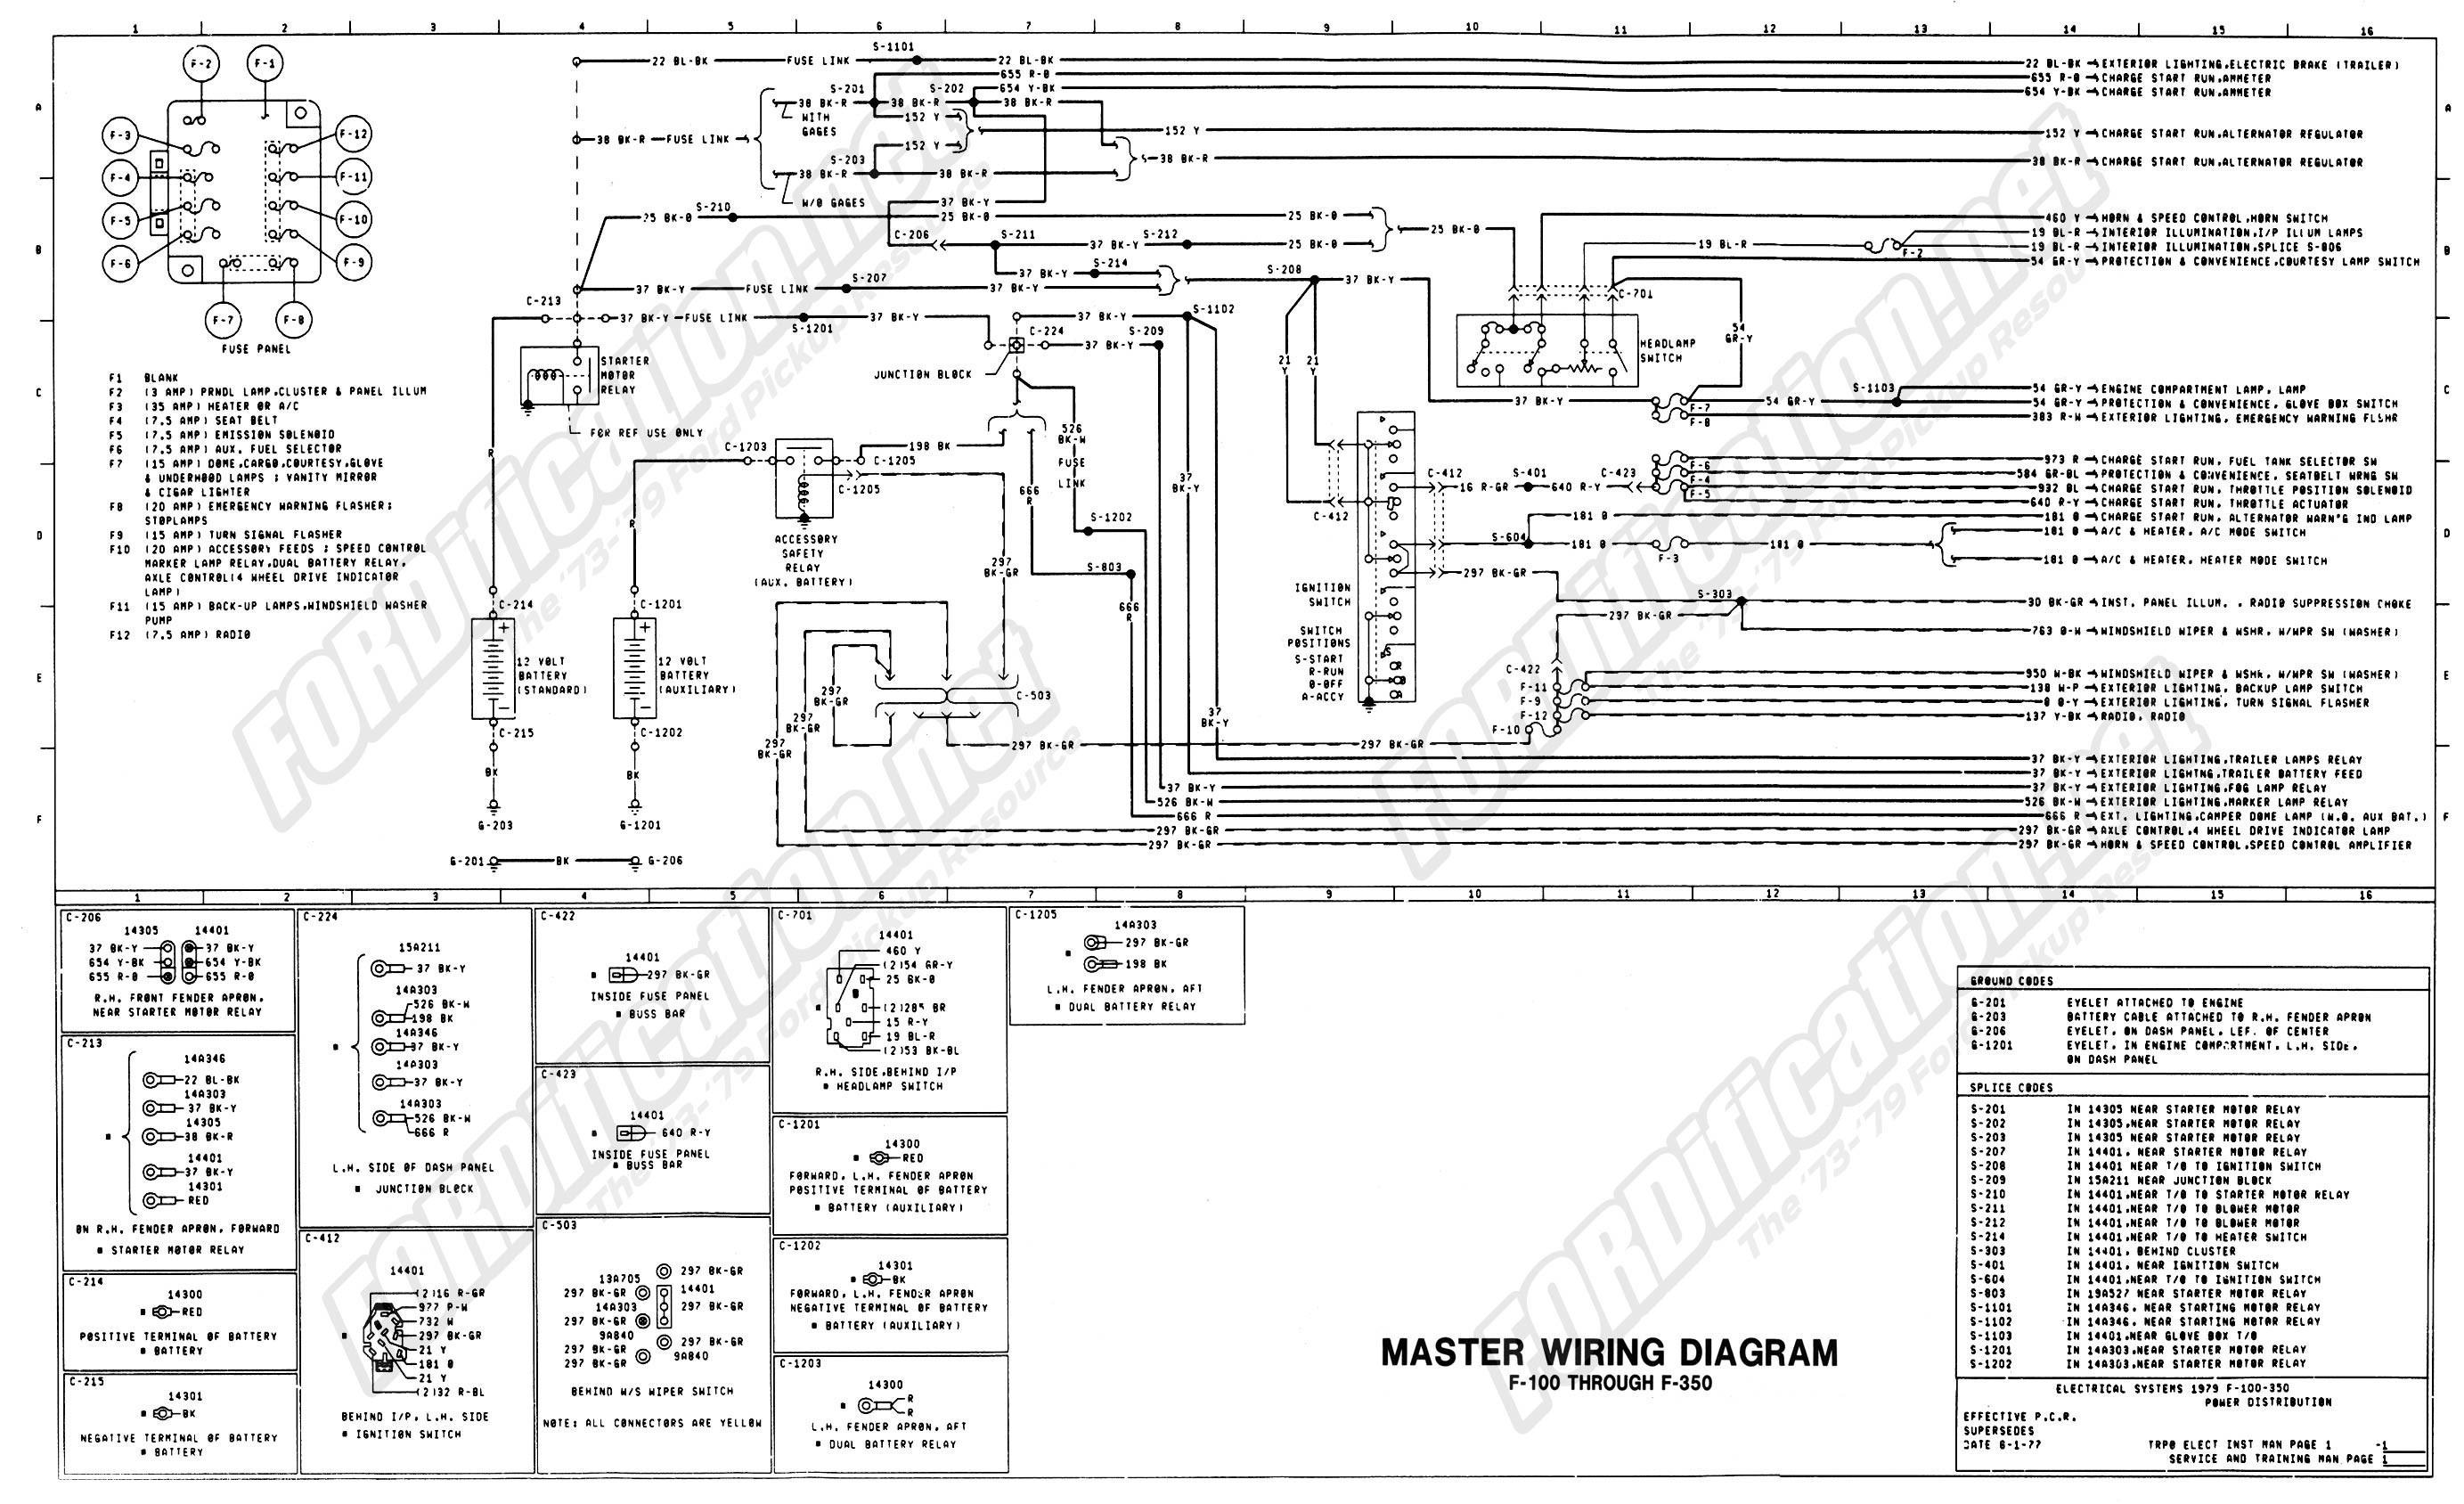 Granite Mack Truck Fuse Box Mack Fuse Diagram 07 Jeep Wrangler Stereo Wiring Diagram